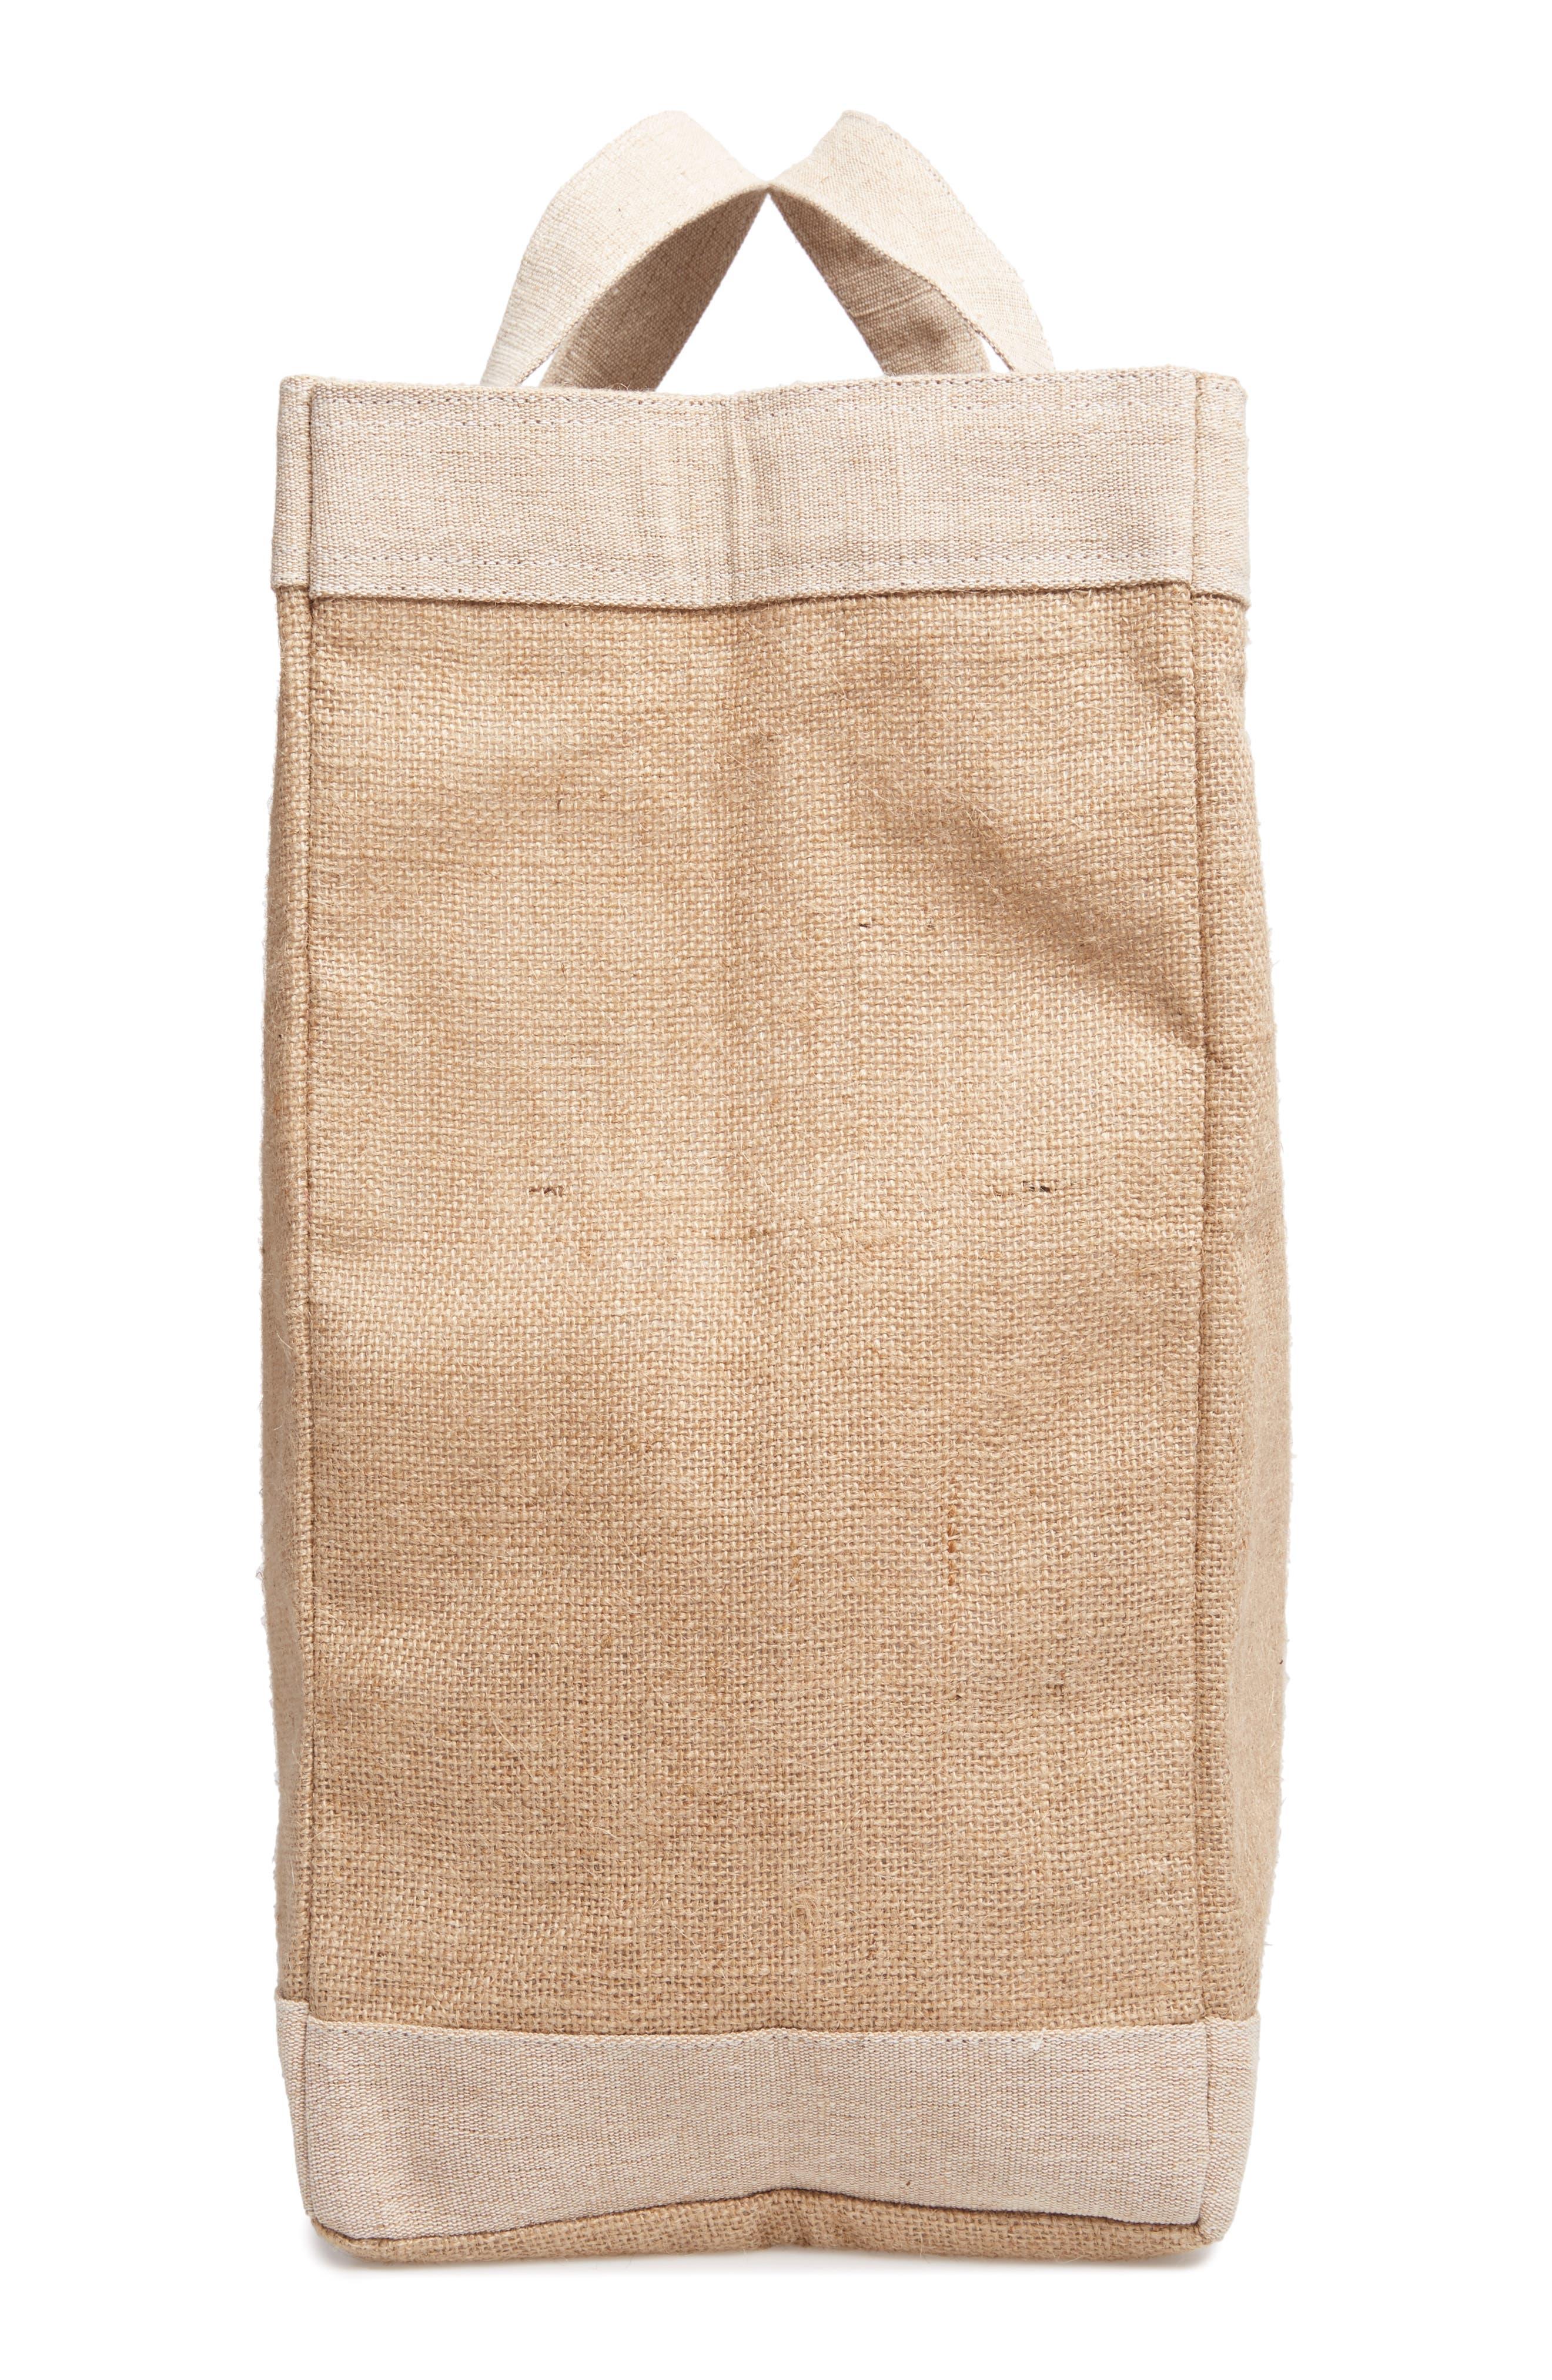 Nashville Simple Market Bag,                             Alternate thumbnail 5, color,                             200